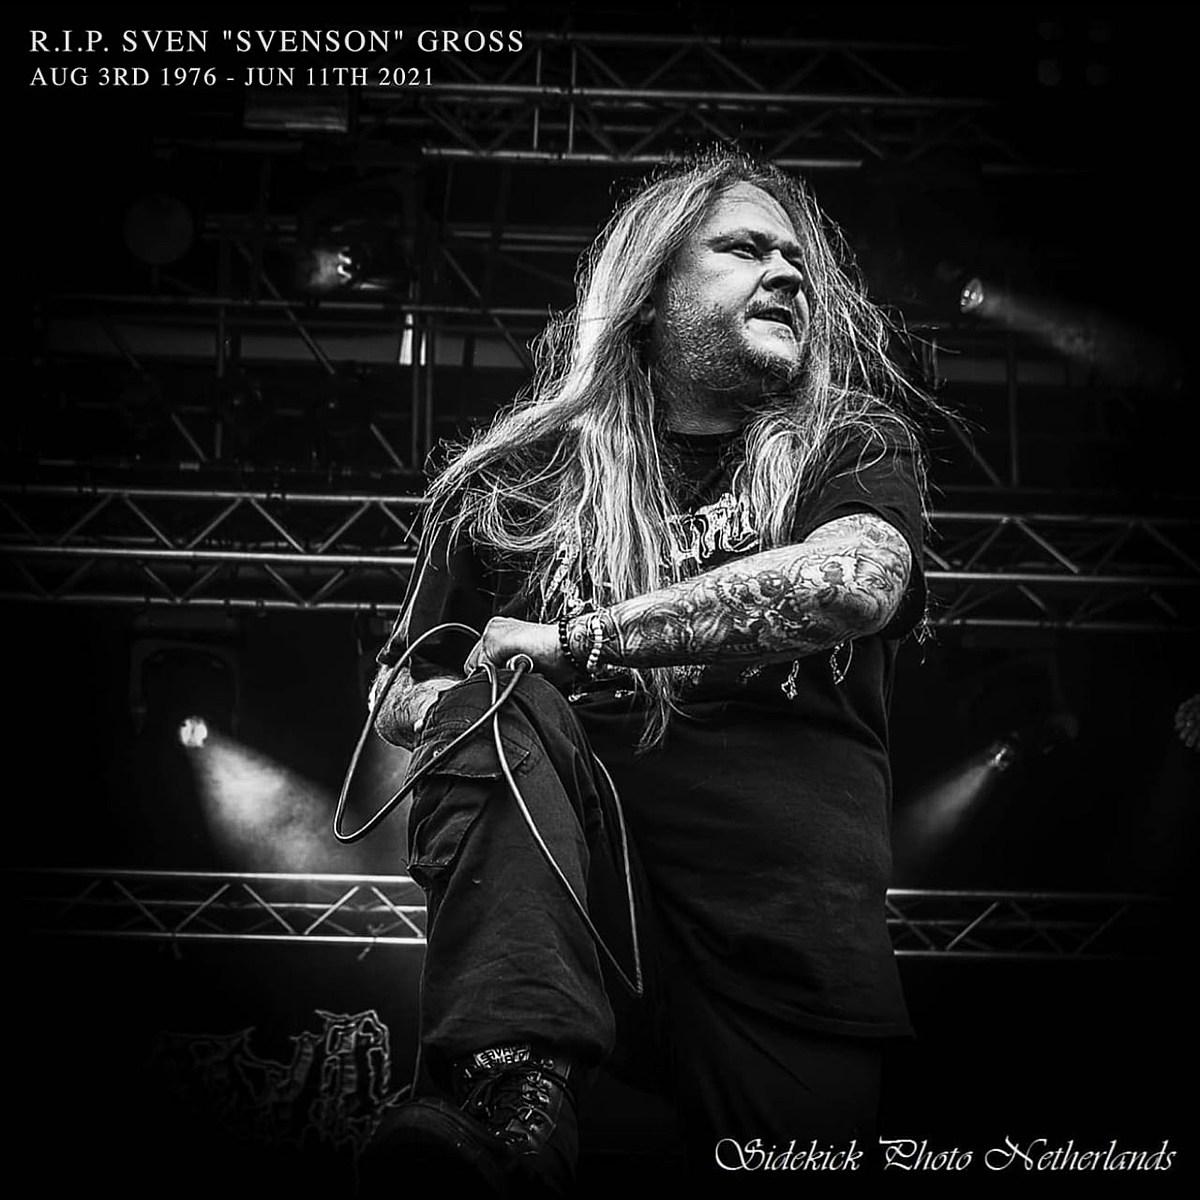 Fleshcrawl vocalist Sven Gross, RIP